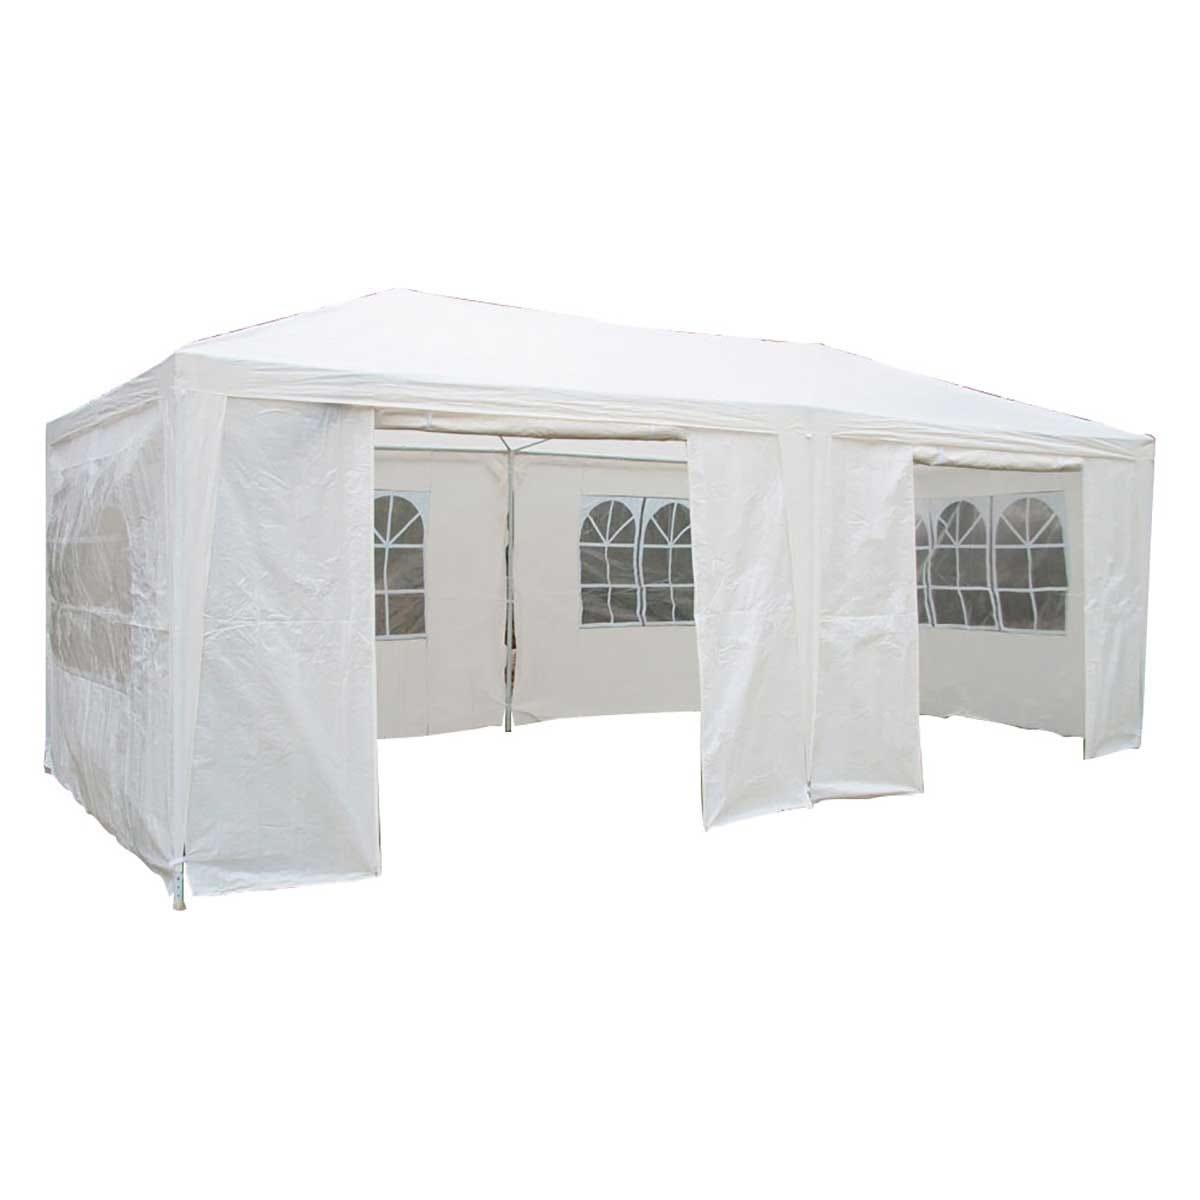 Airwave 6m x 3m Value Party Tent Gazebo - White